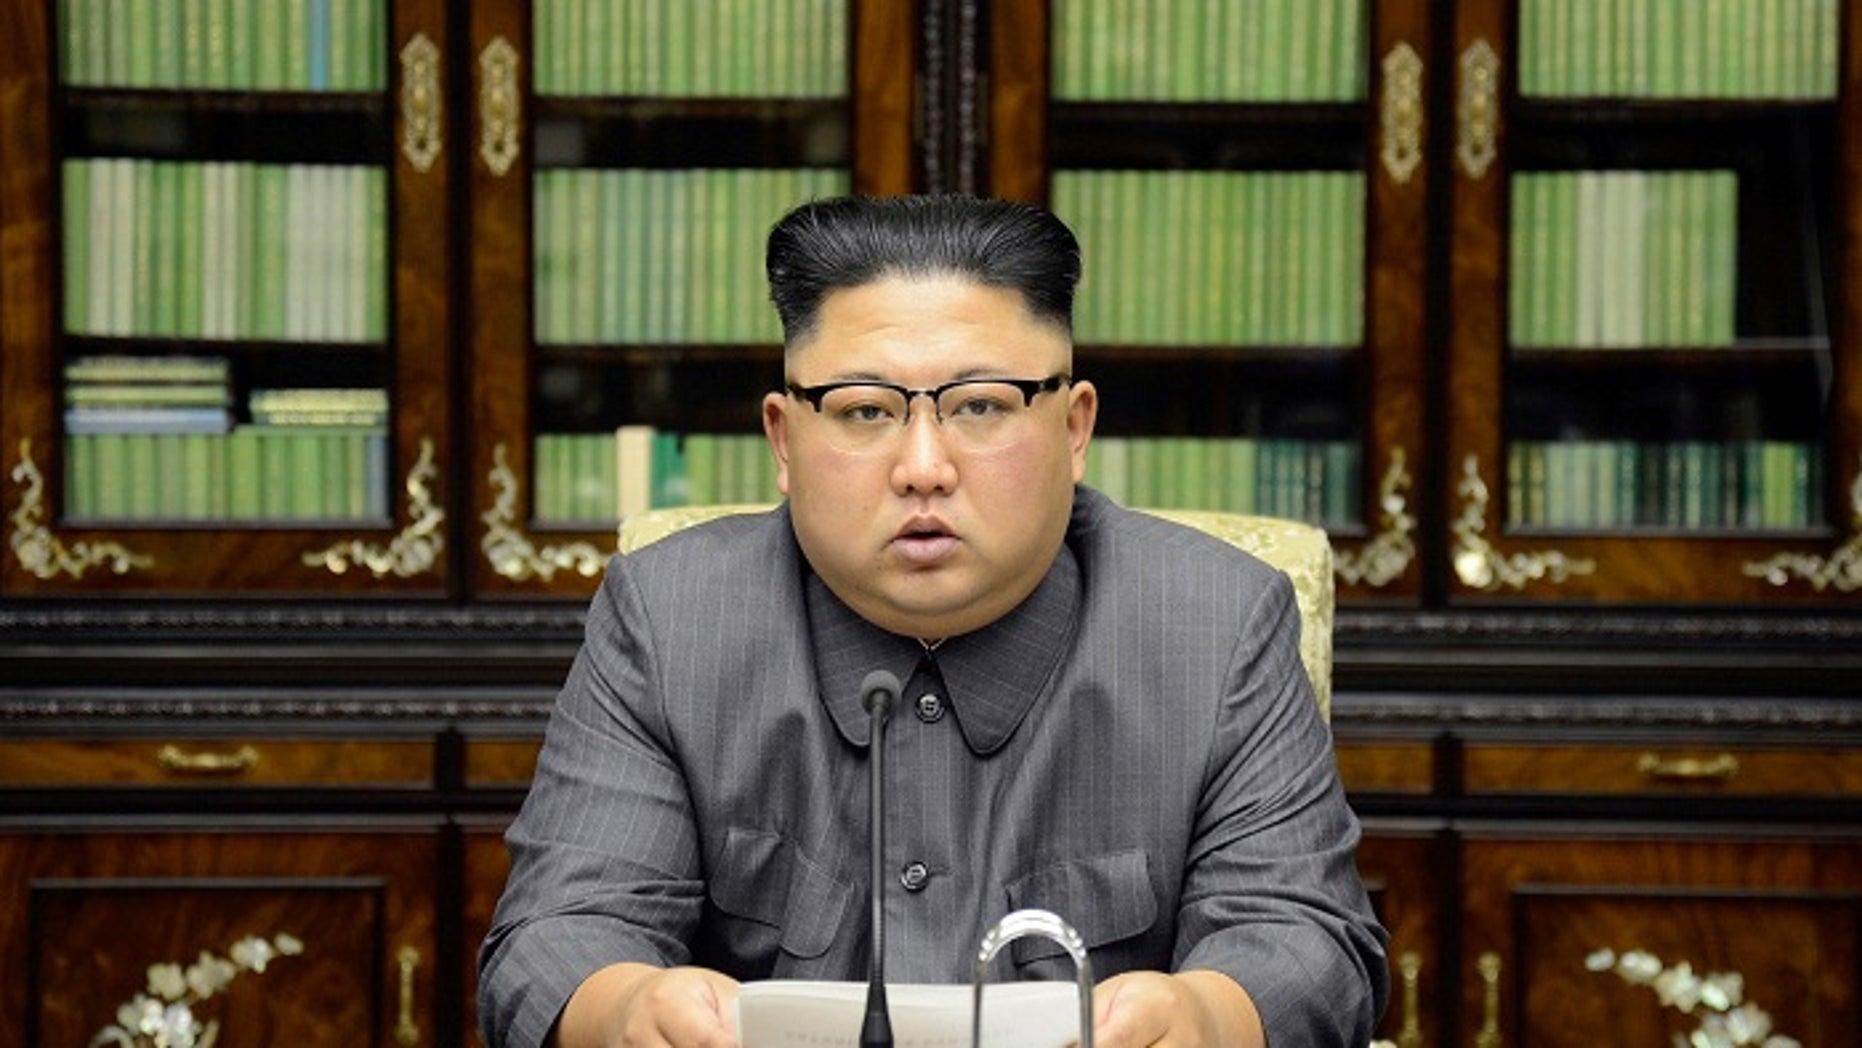 North Korean leader Kim Jong Un makes a statement regarding U.S. President Donald Trump's speech at the U.N. General Assembly.